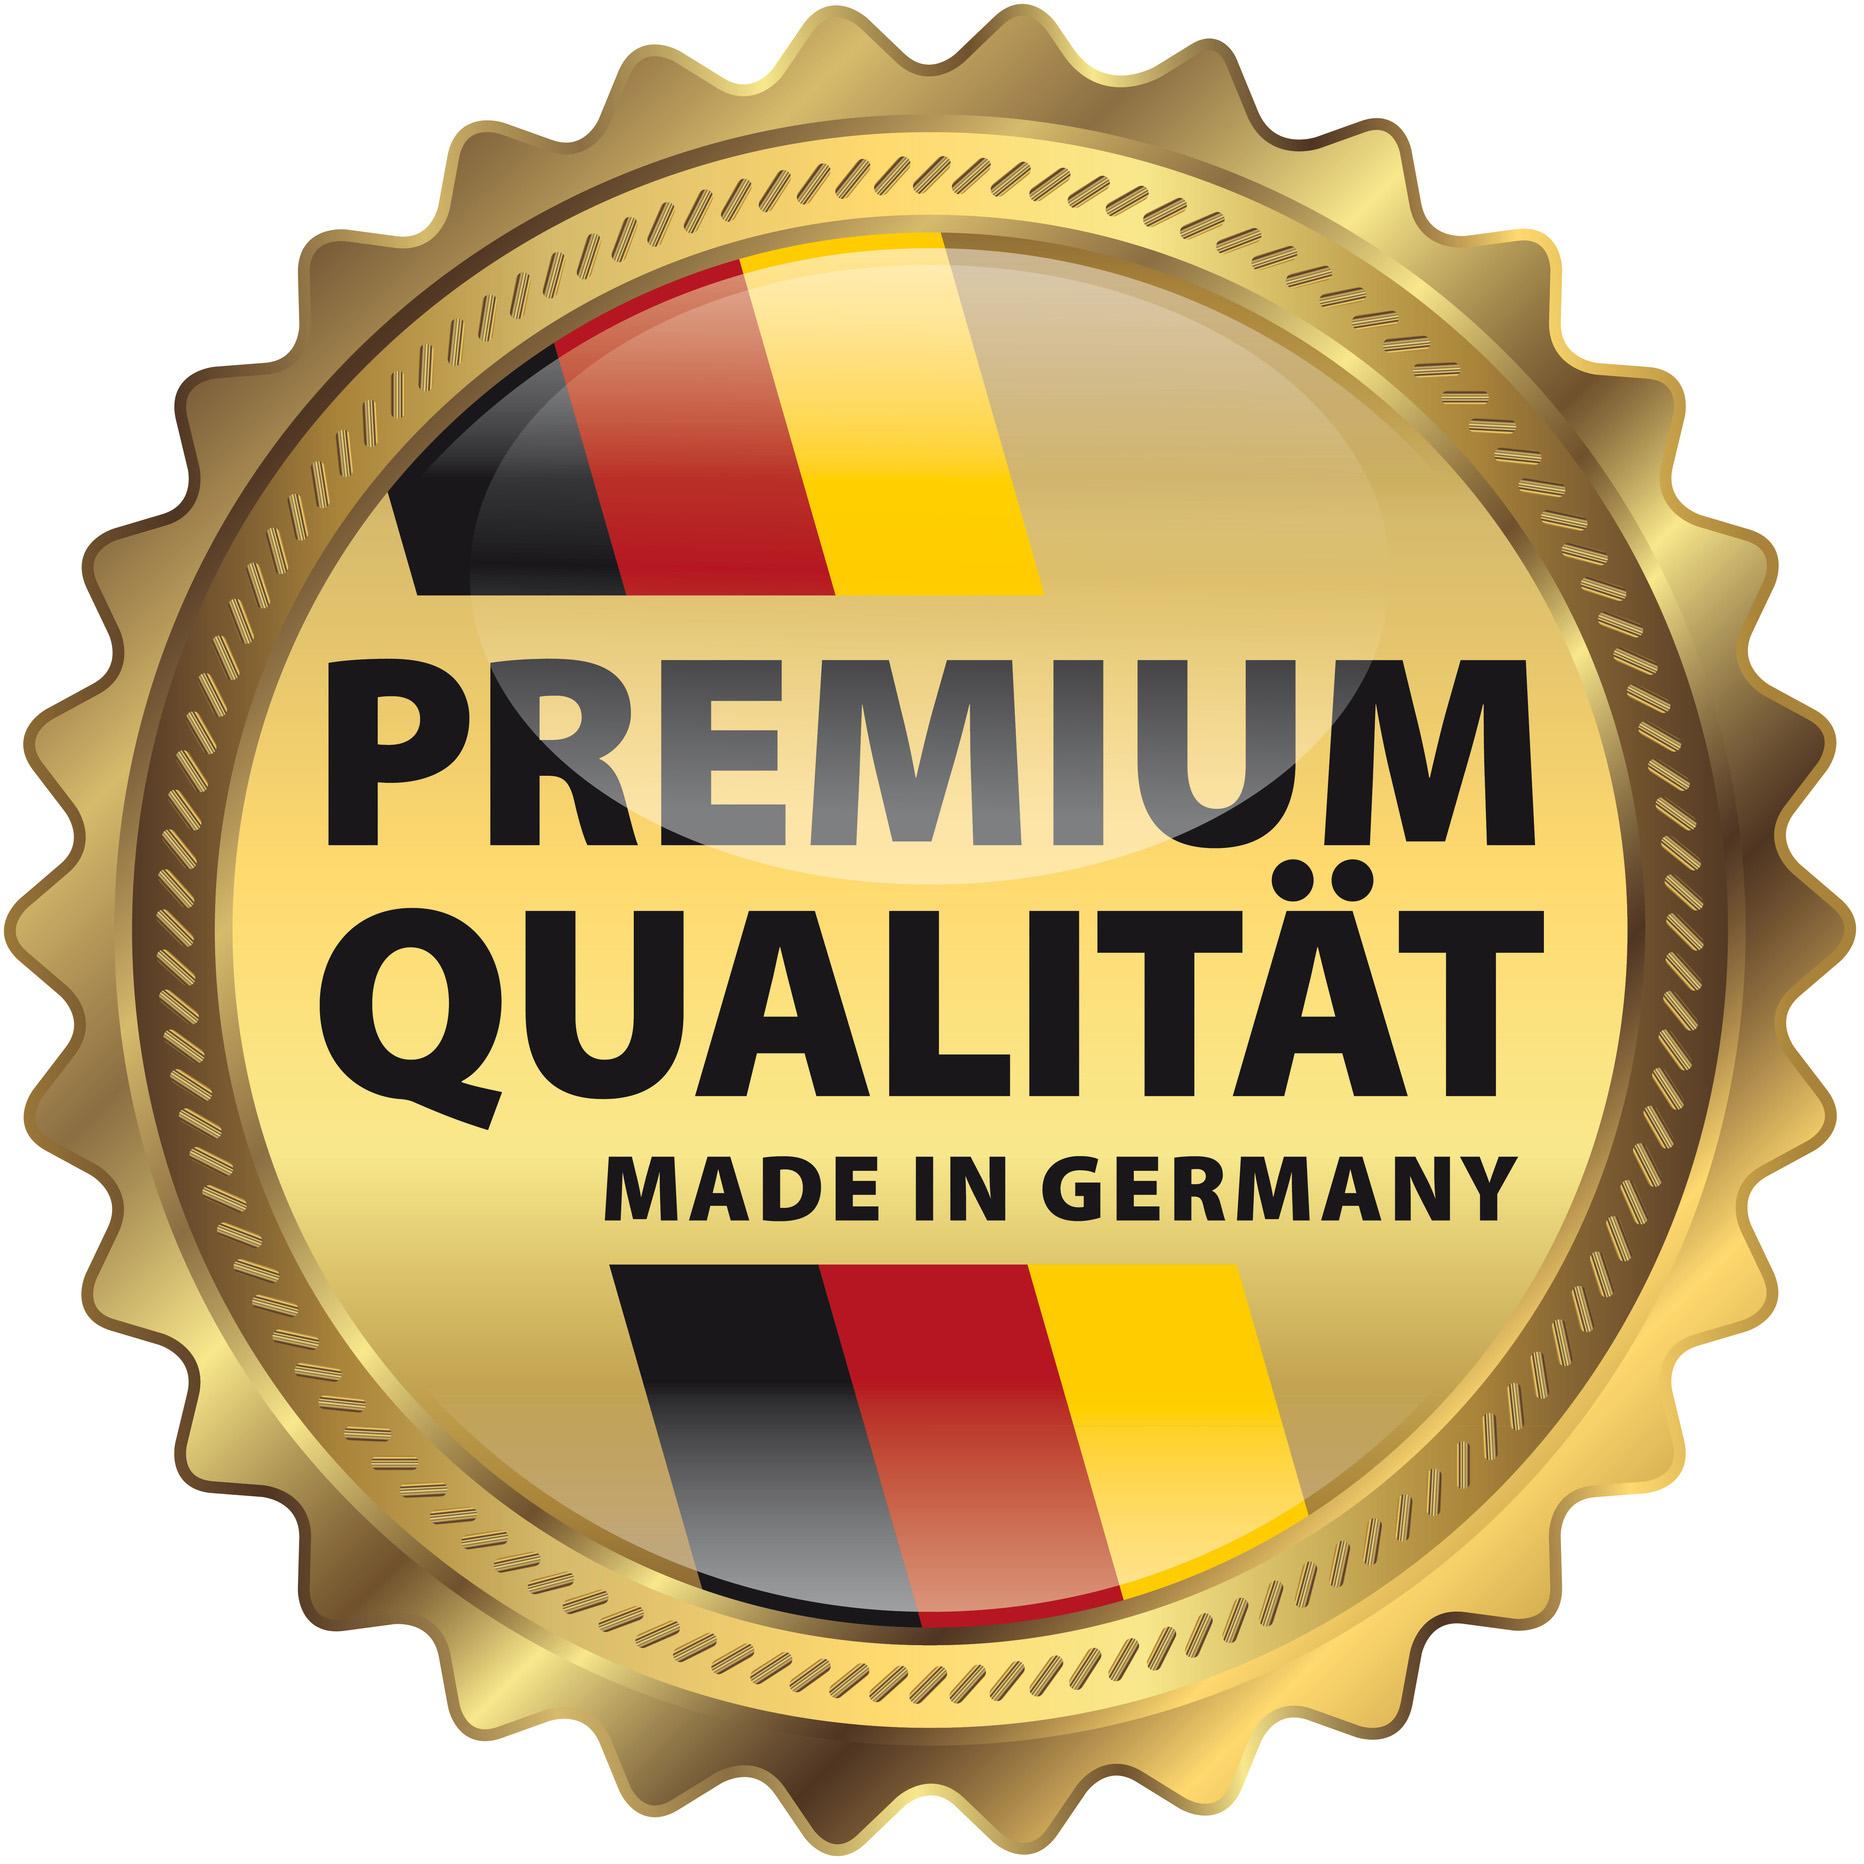 Premium Qualität - Made in Germany